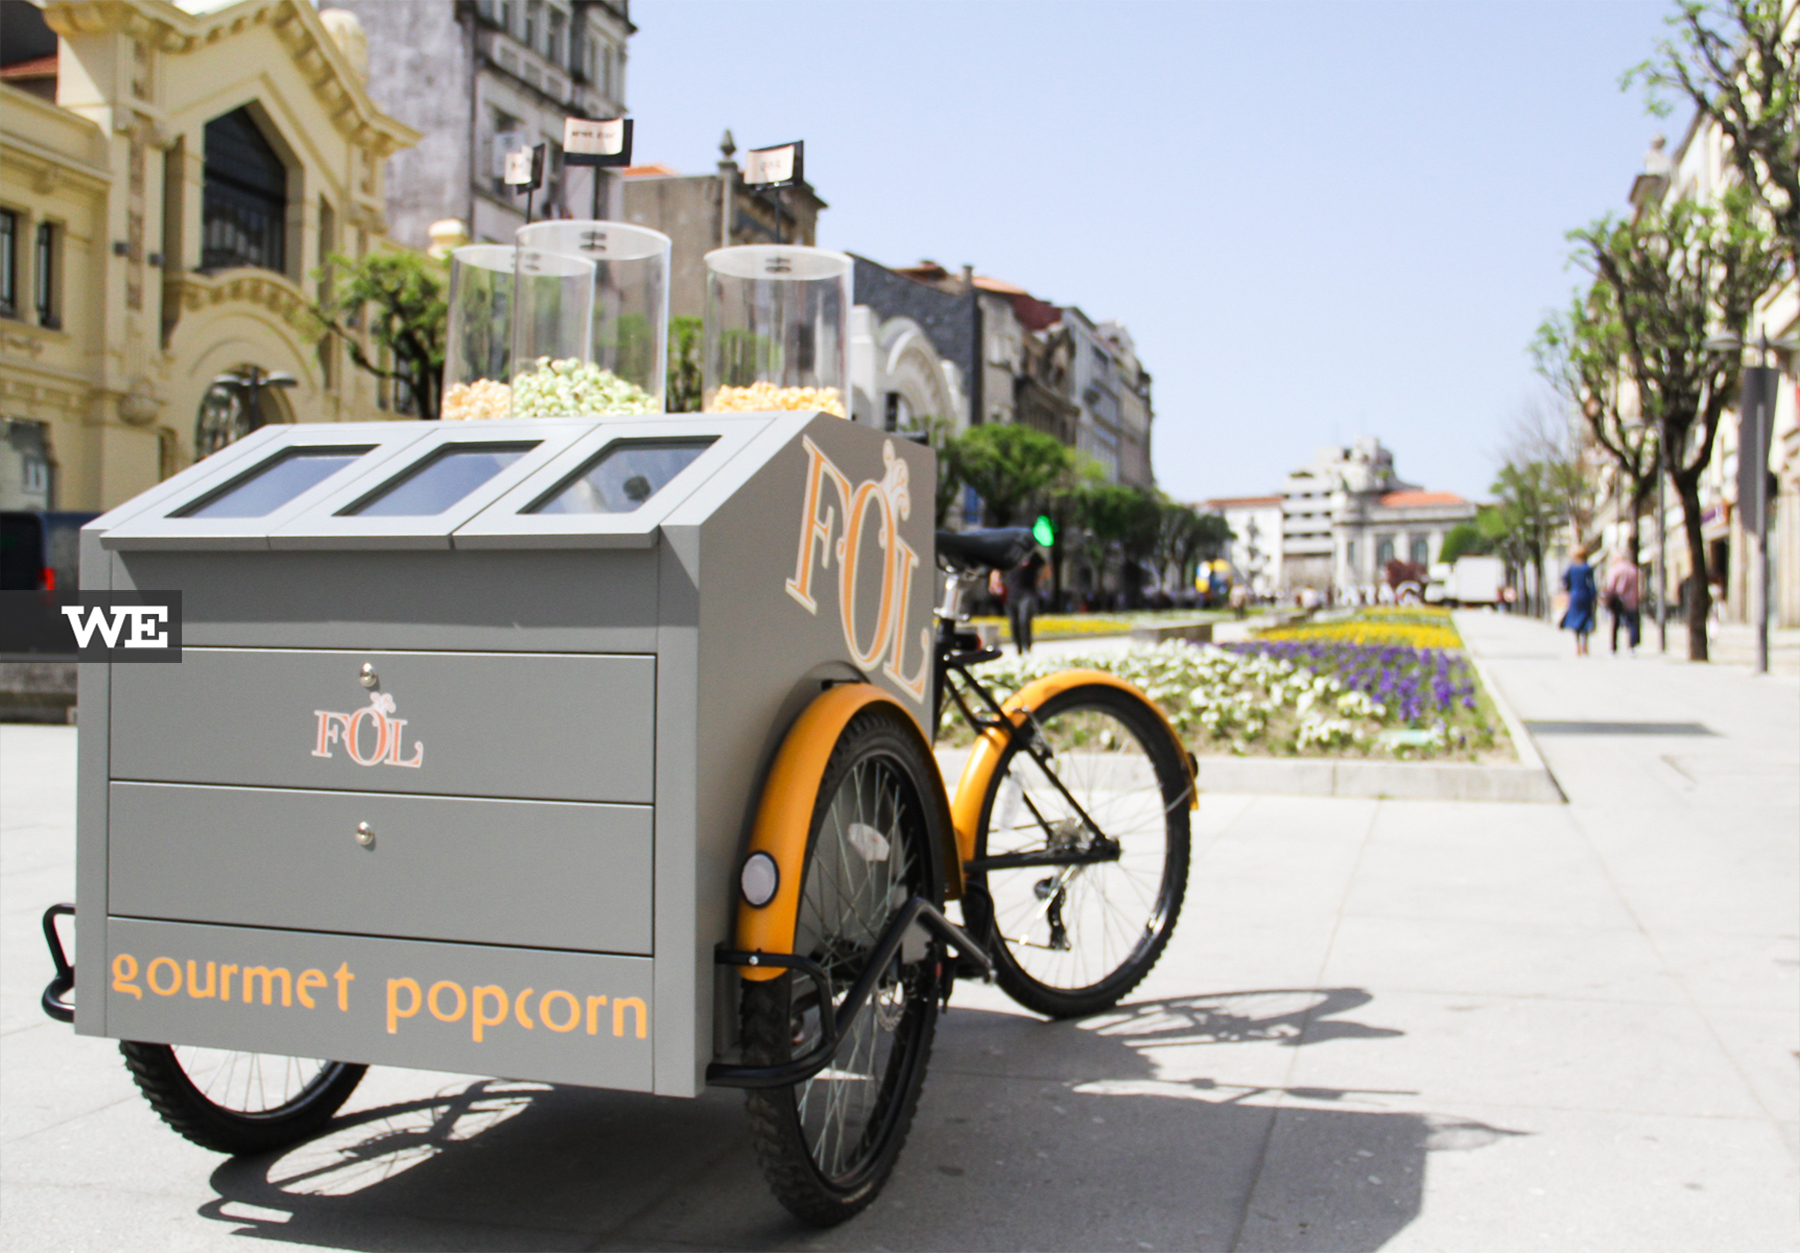 Bicicleta FOL Popcorn